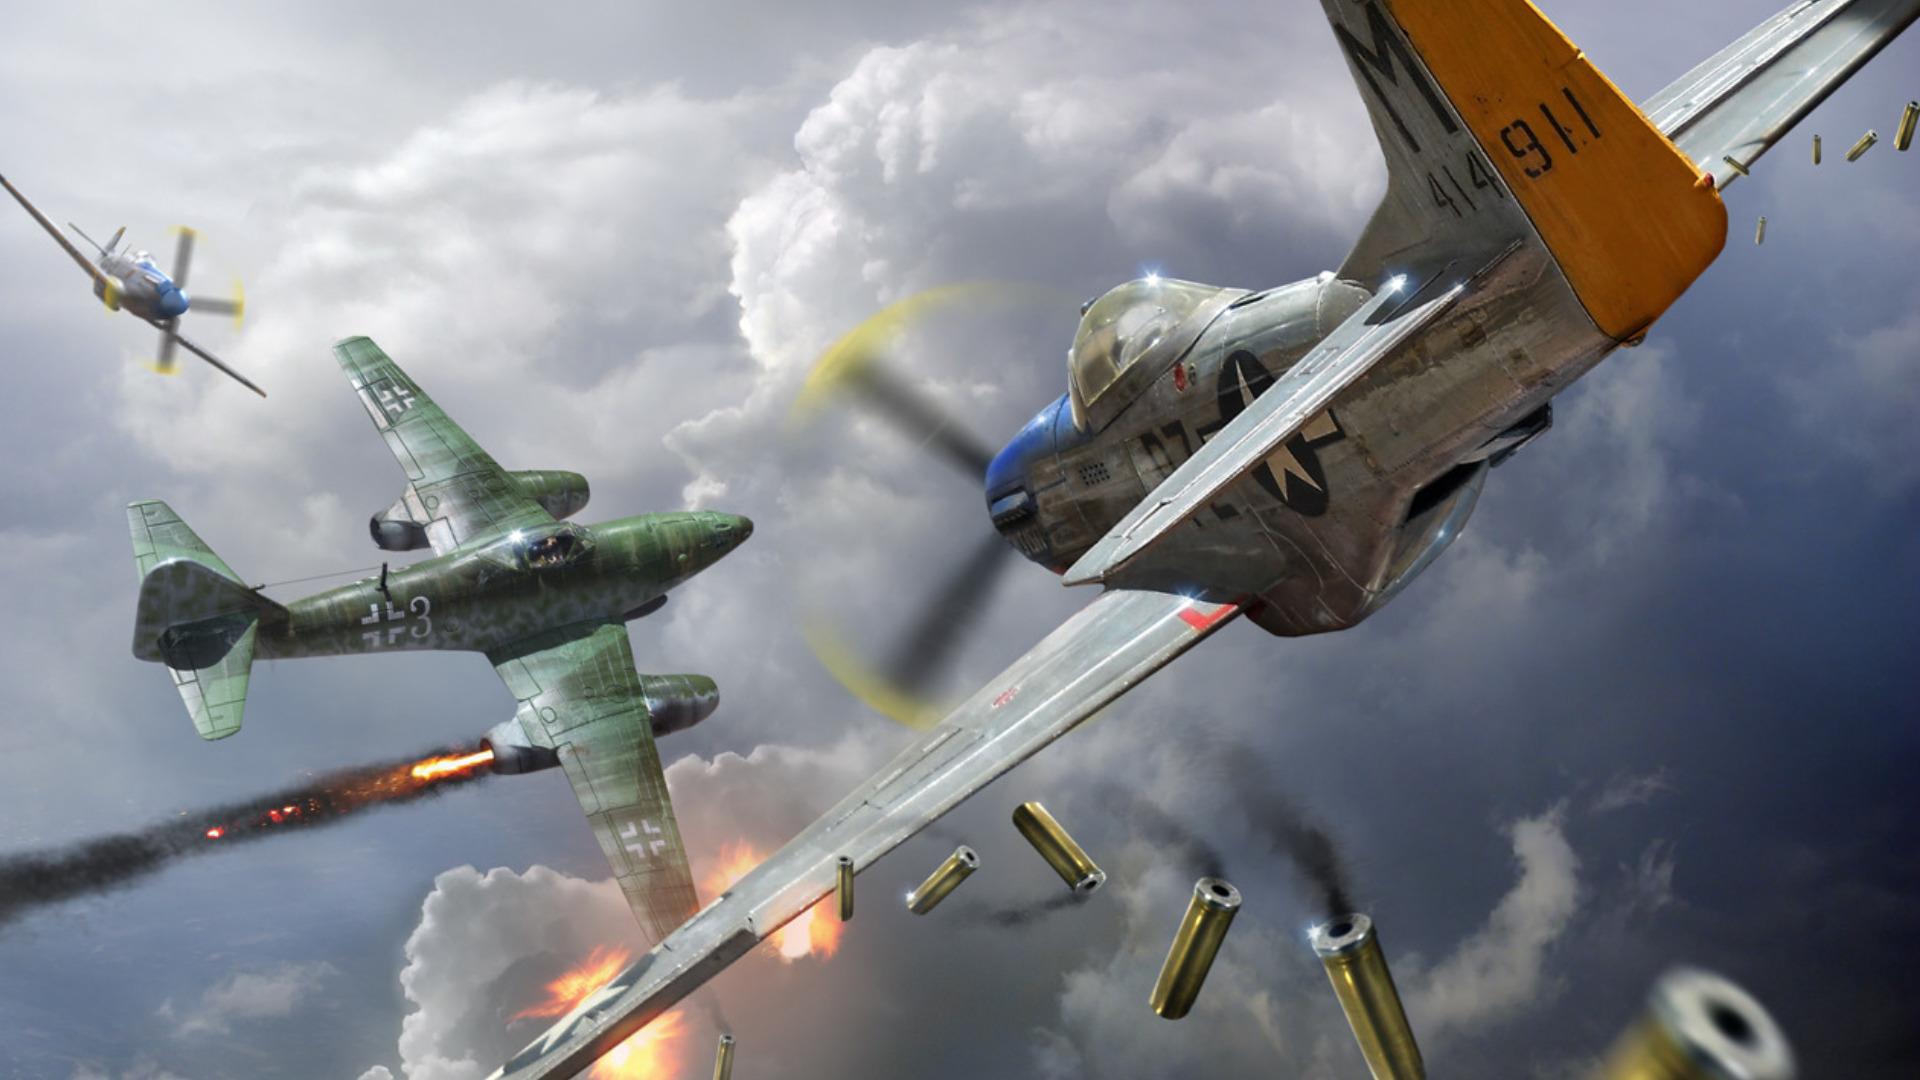 ww2 military aircraft wallpaper